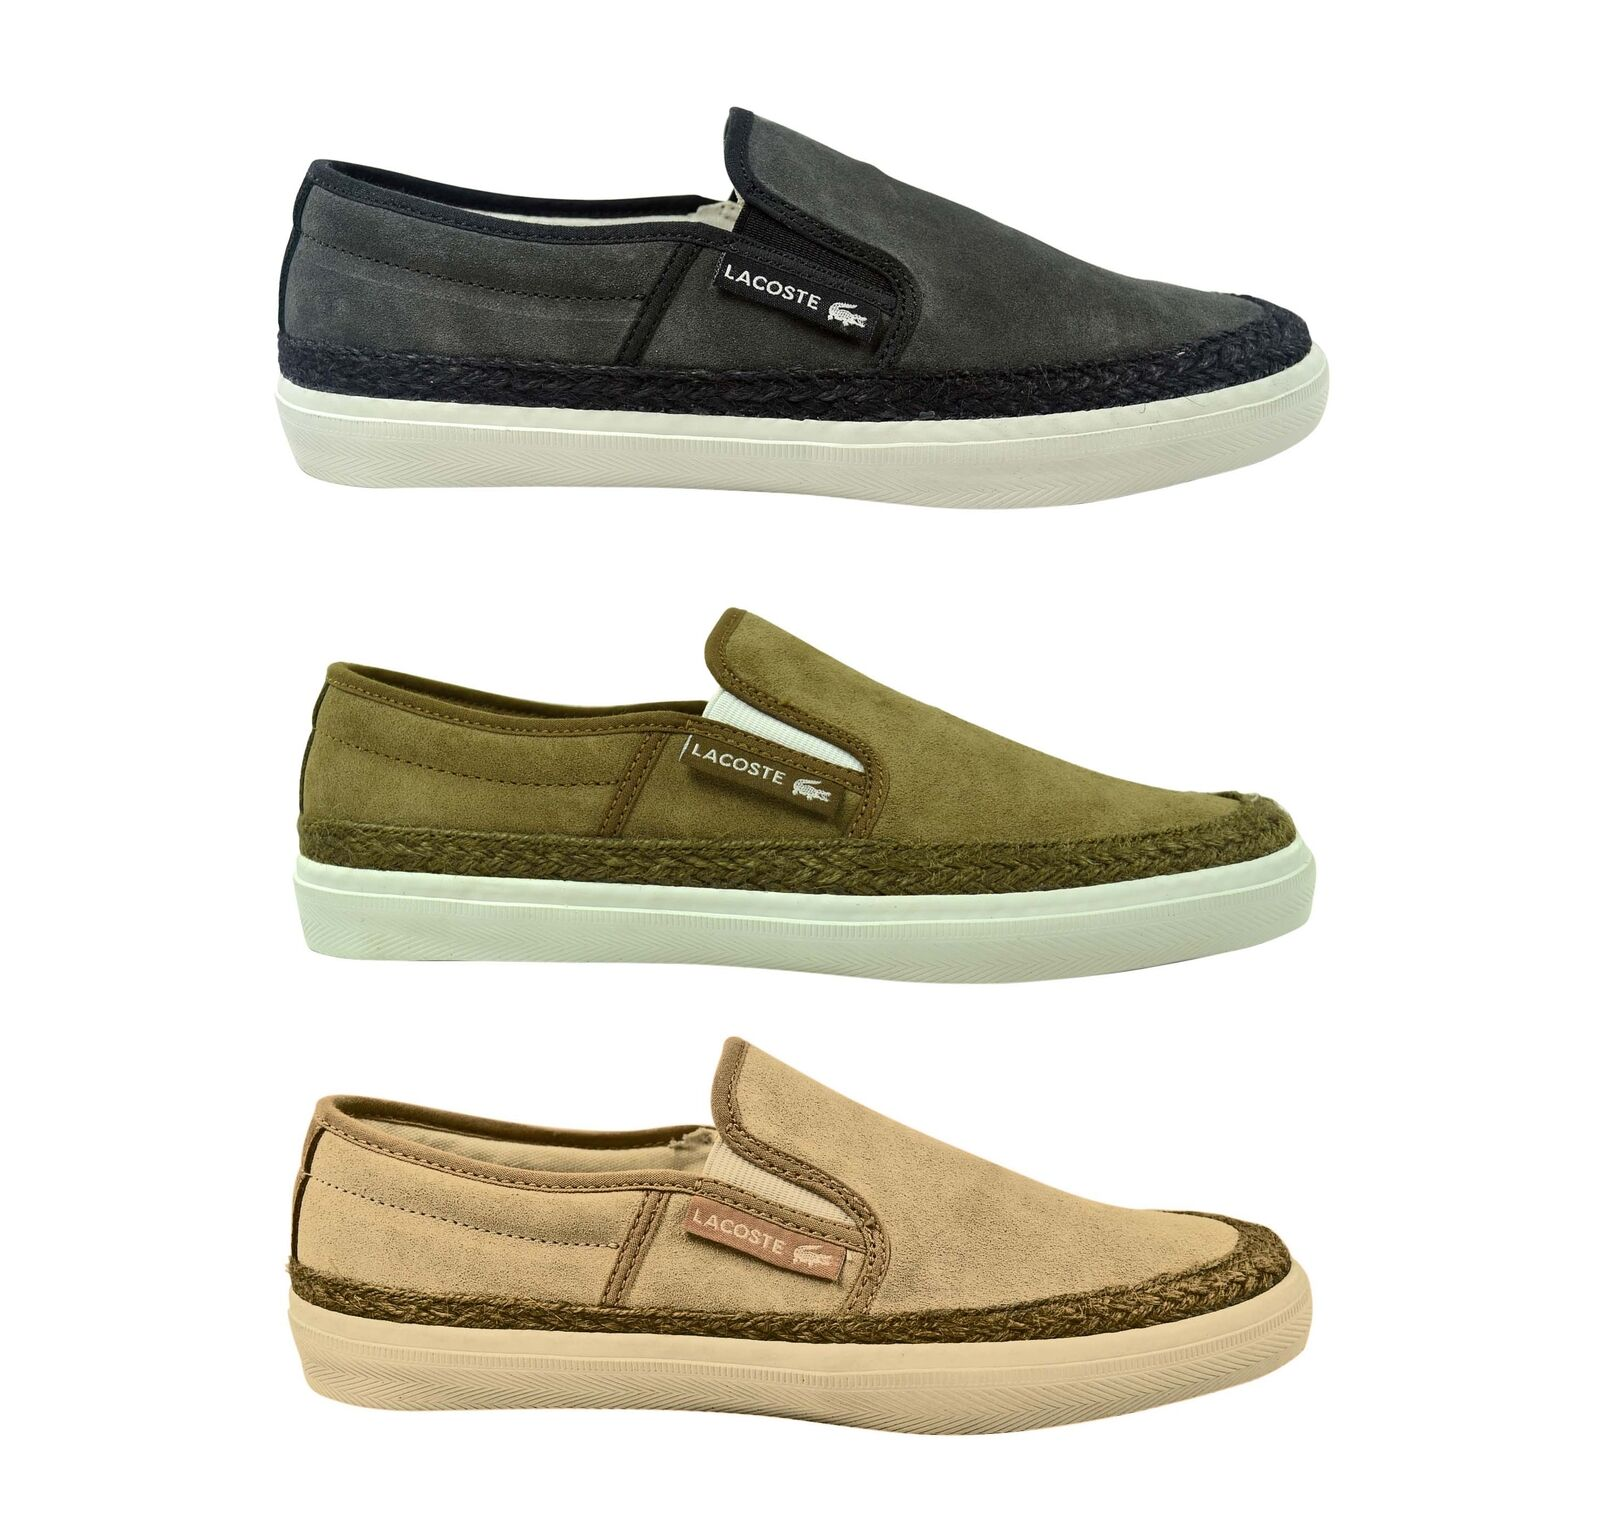 Lacoste Gazon 2 SRM dark grey, brown,off white Slipper Schuhe/Sneaker braun/grau